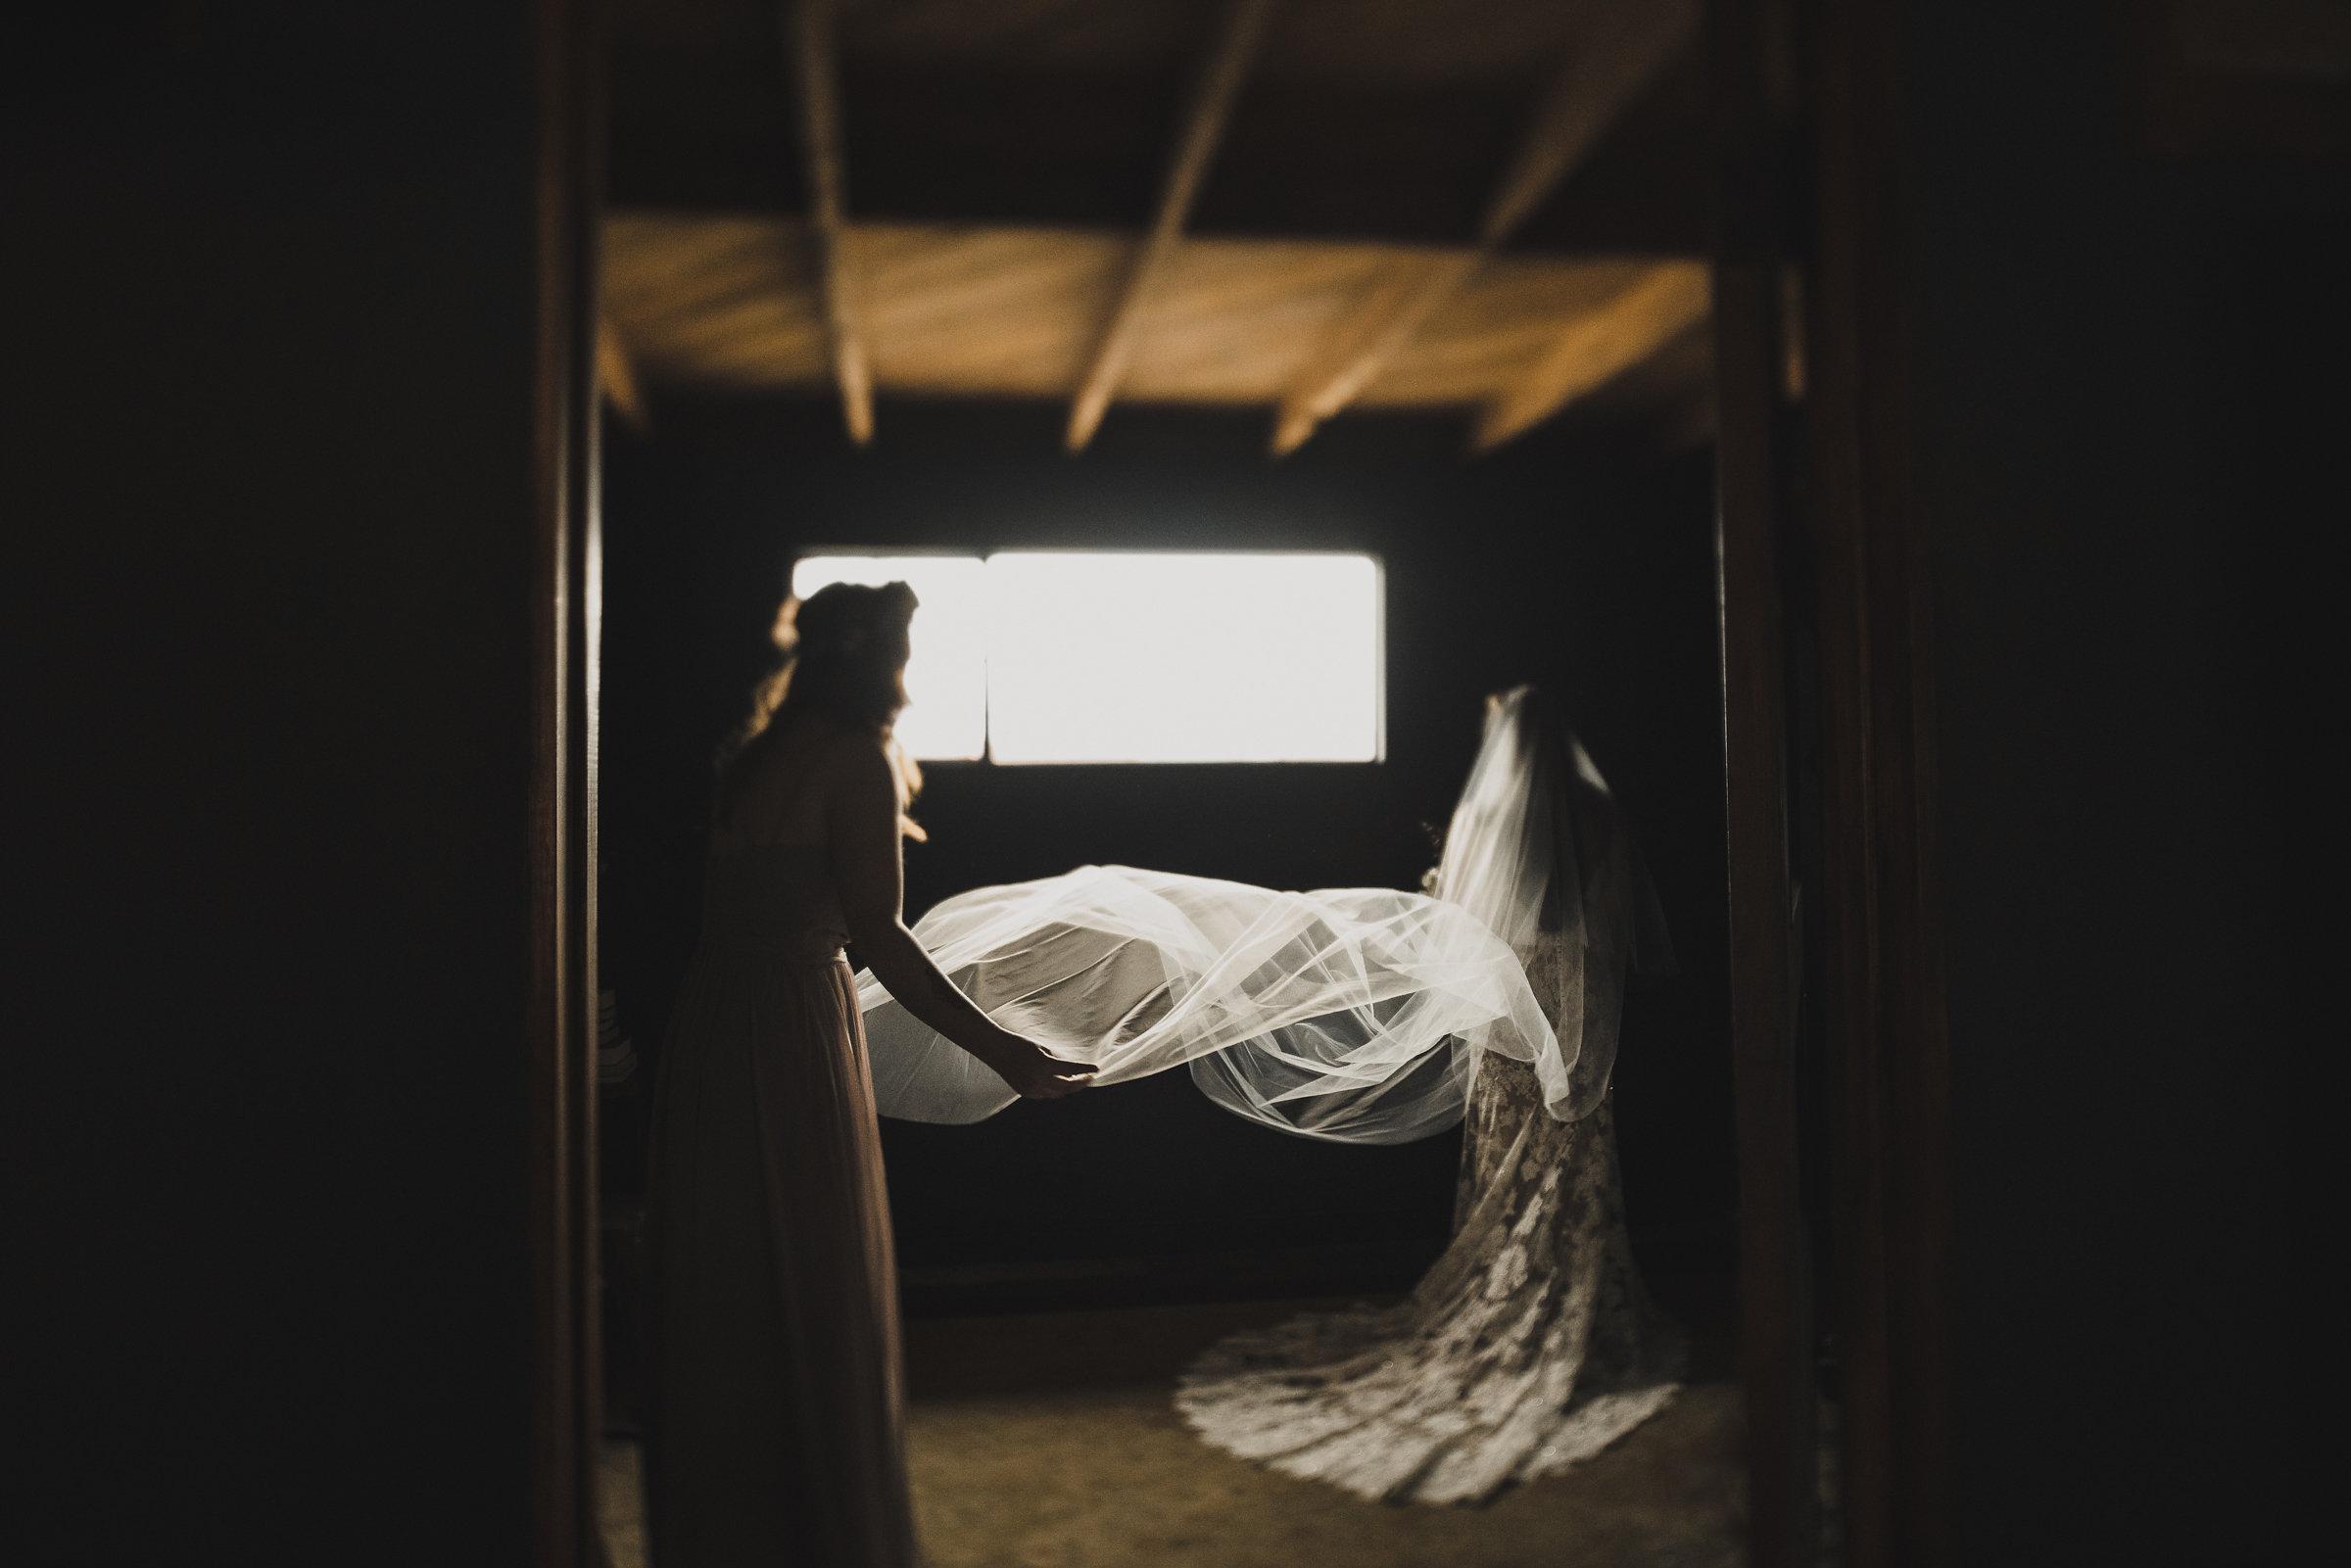 Isaiah+TaylorPhotography-SmokyHollowStudiosWedding,ElSegundo,LosAngelesWeddingPhotographer-19.jpg